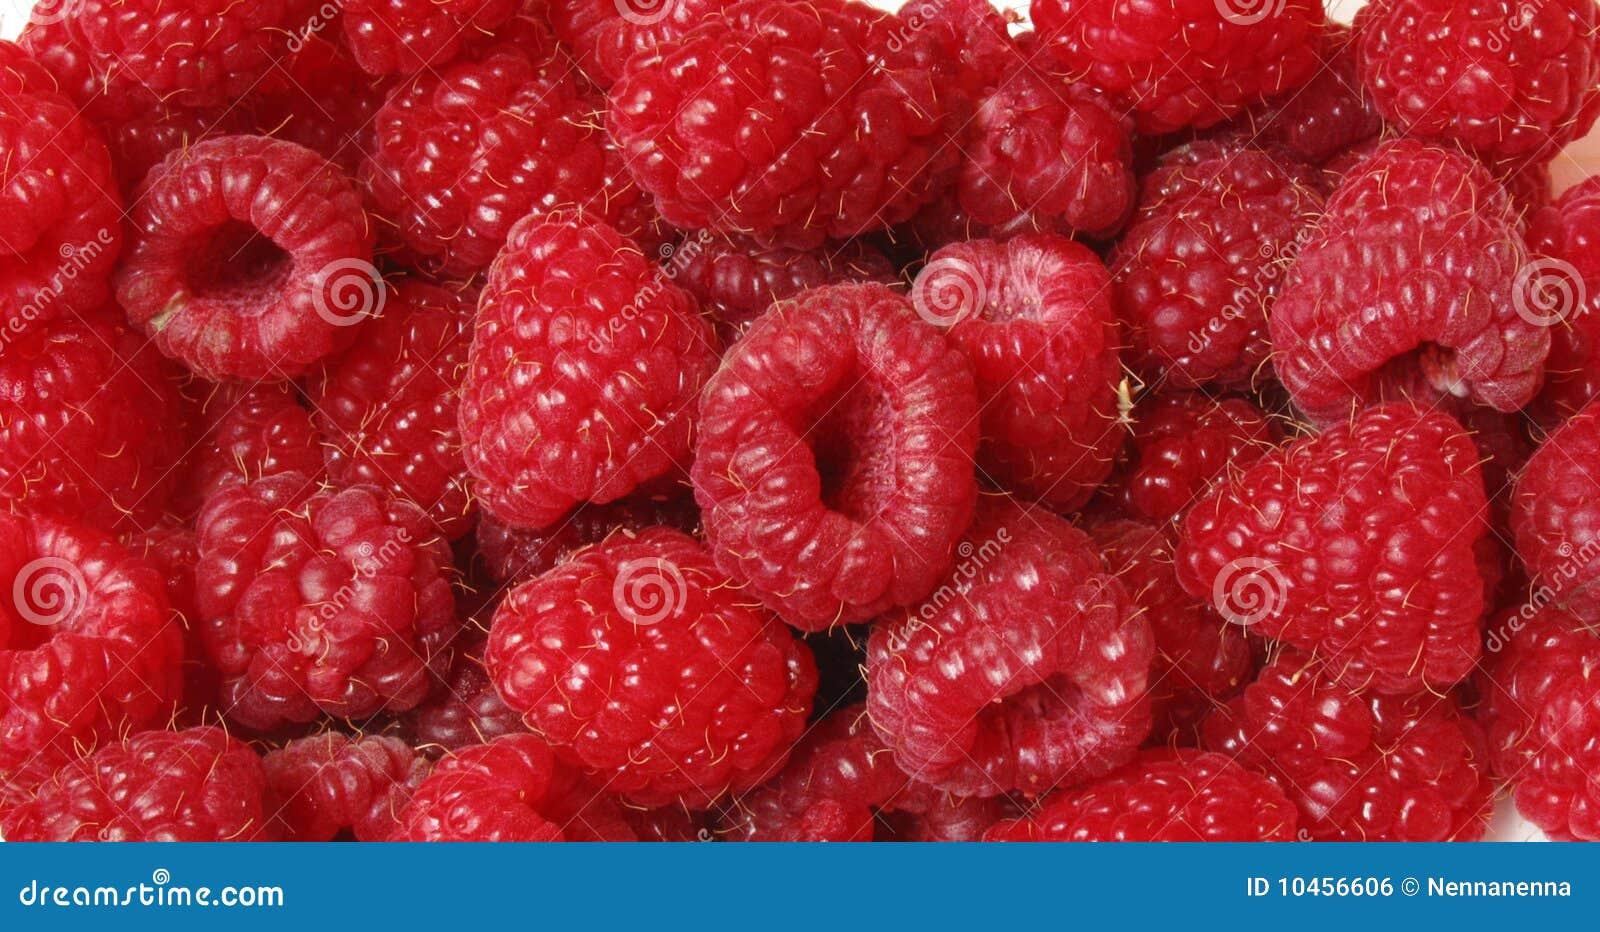 Download Good food stock photo. Image of harvest, fresh, health - 10456606